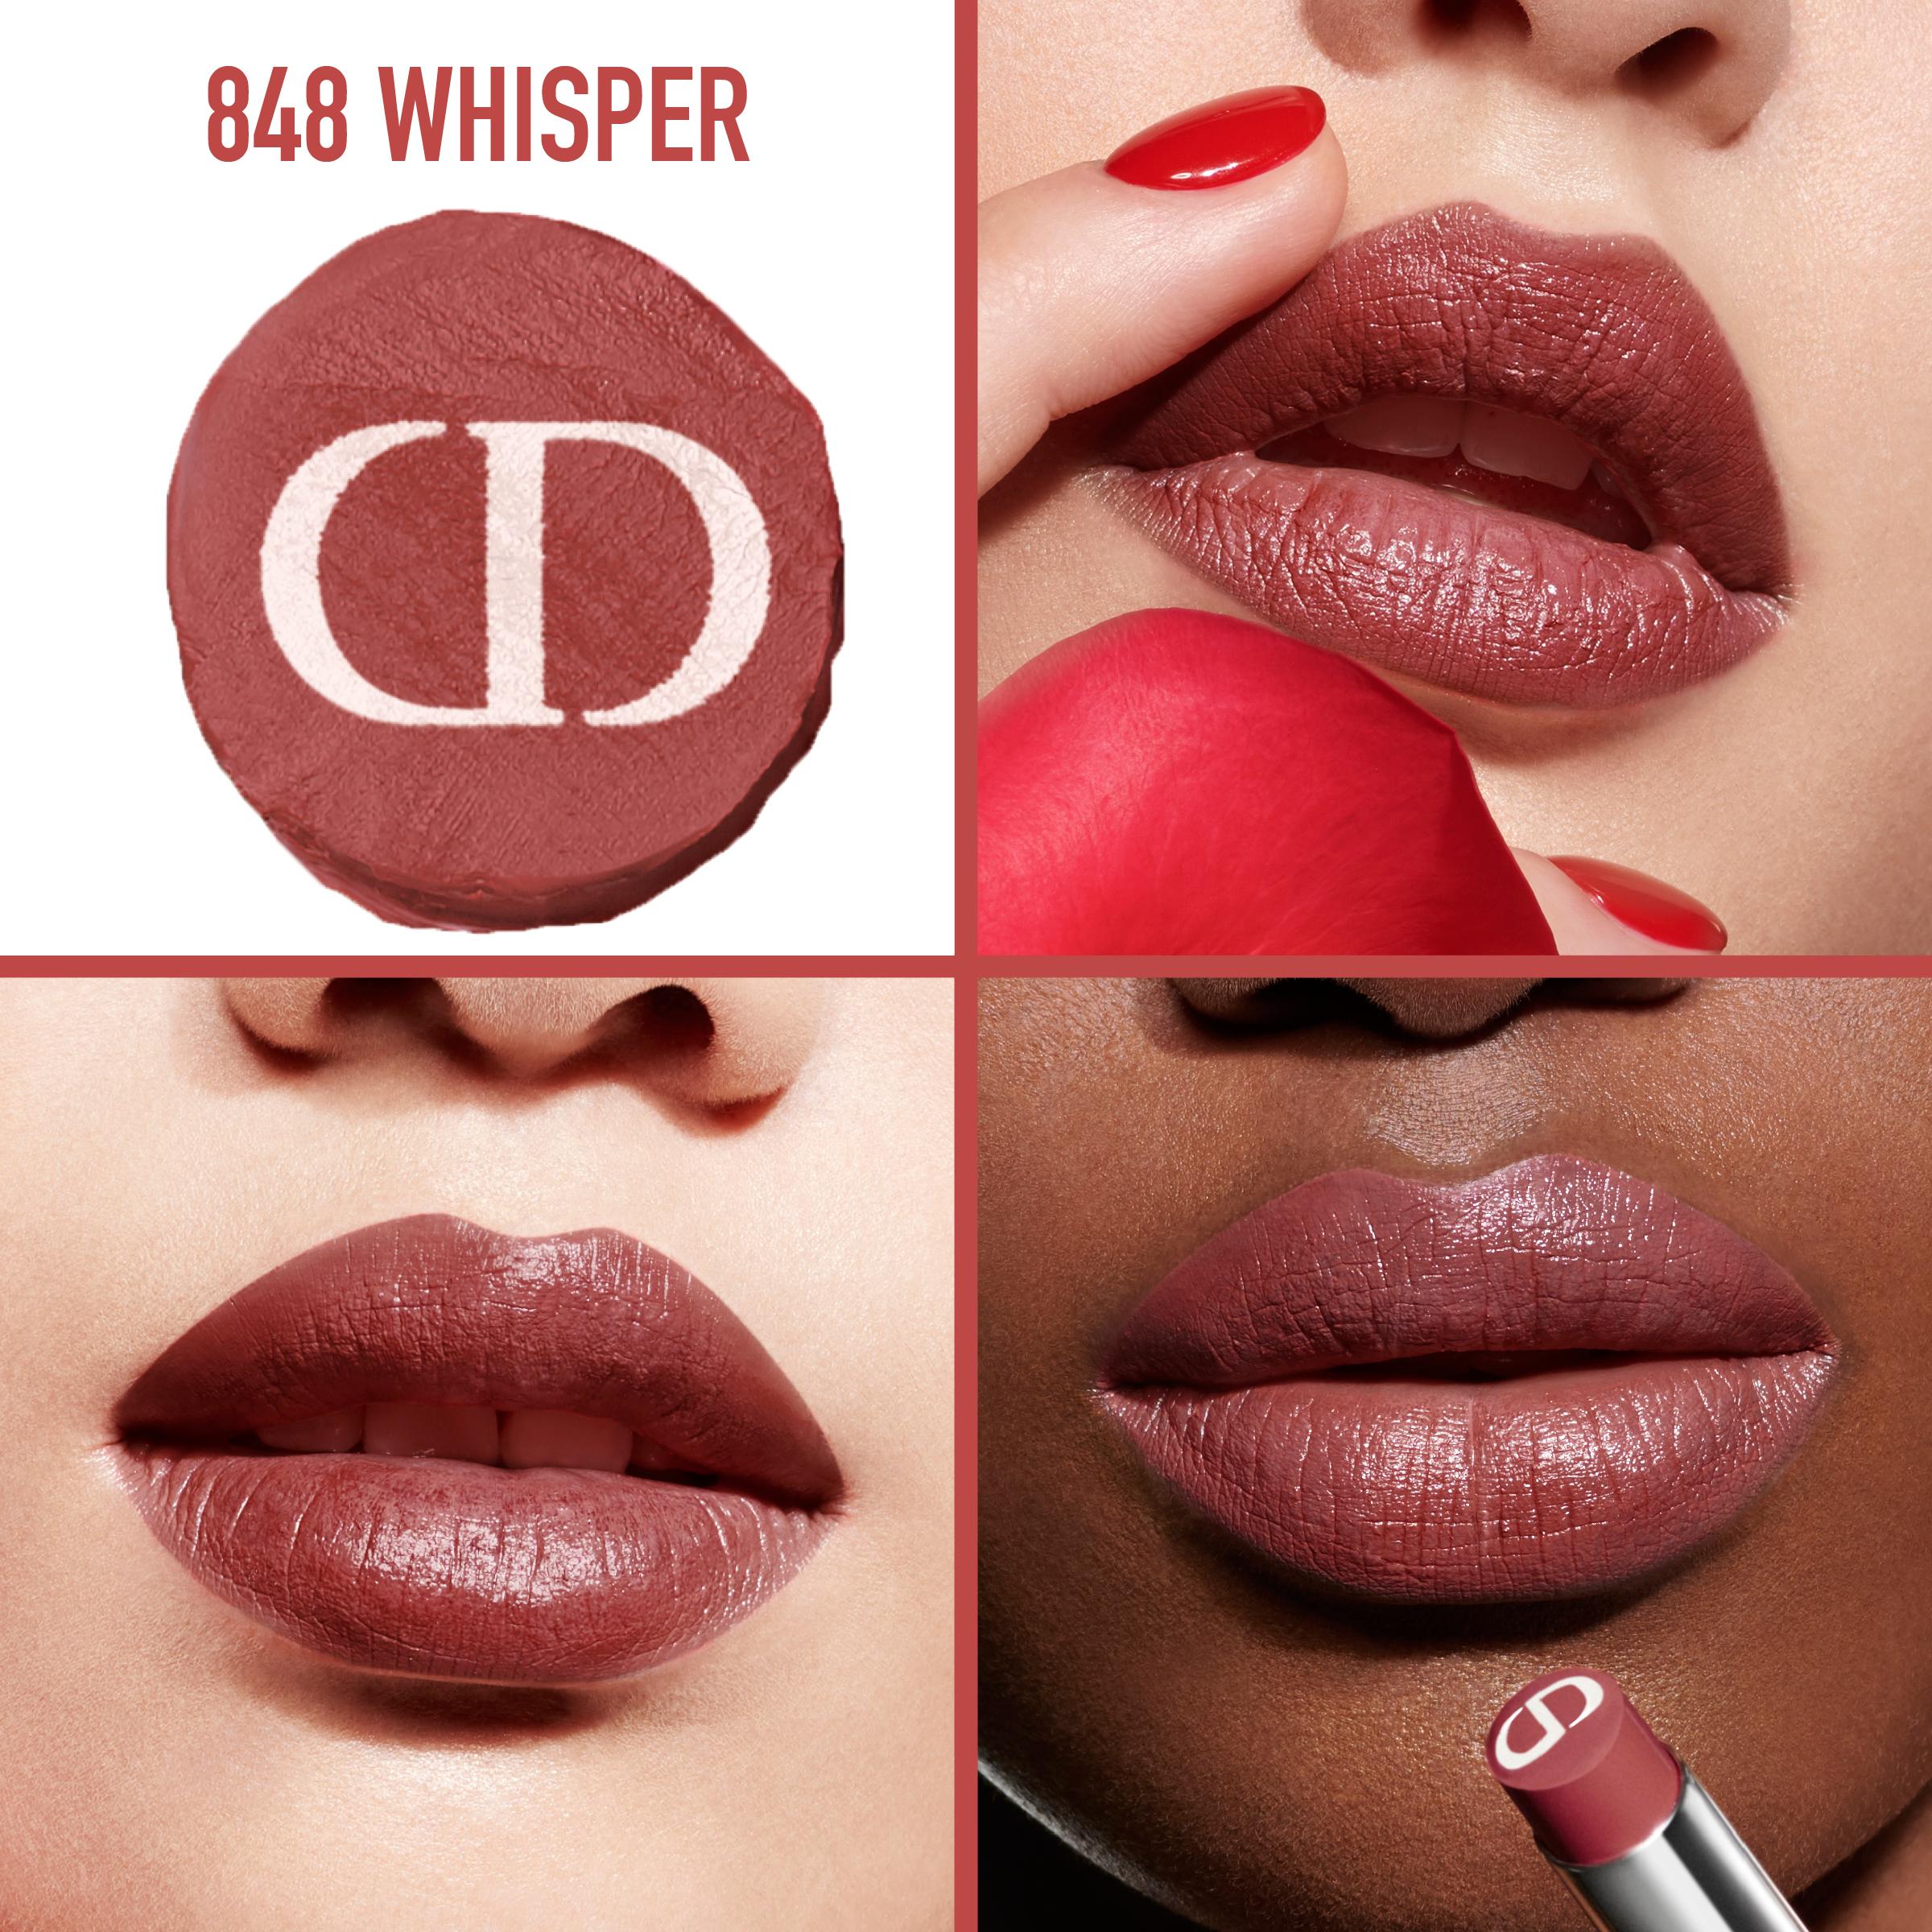 DIOR Rouge Dior Ultra Care, 848 Whisper